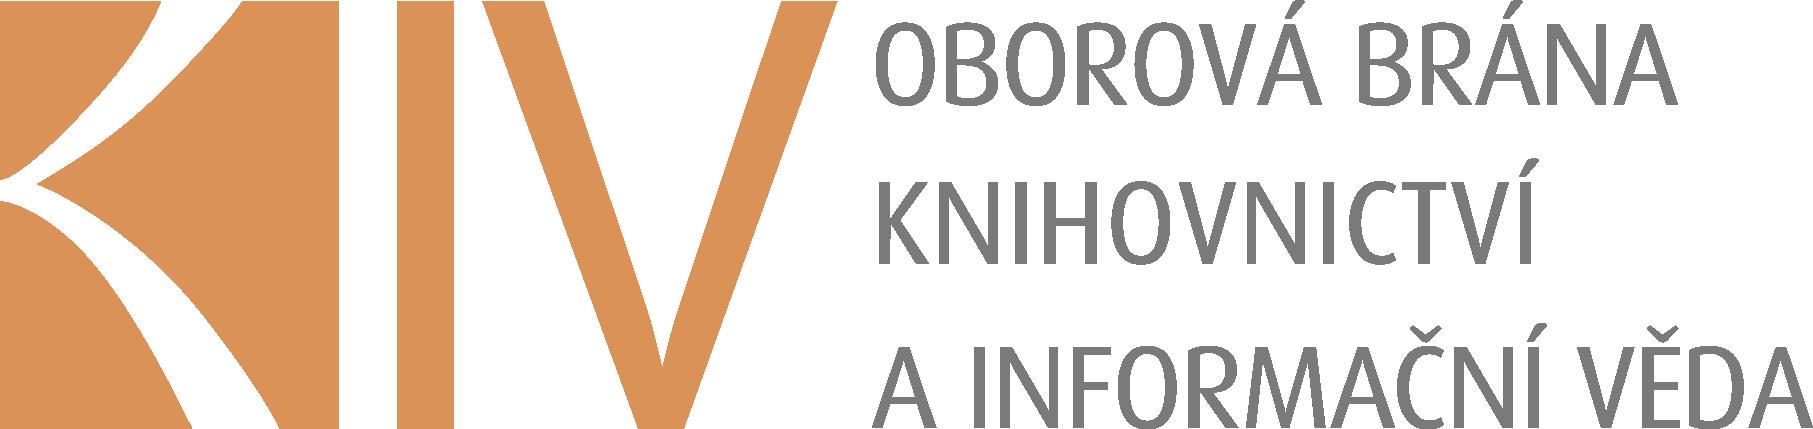 KIV-k.png